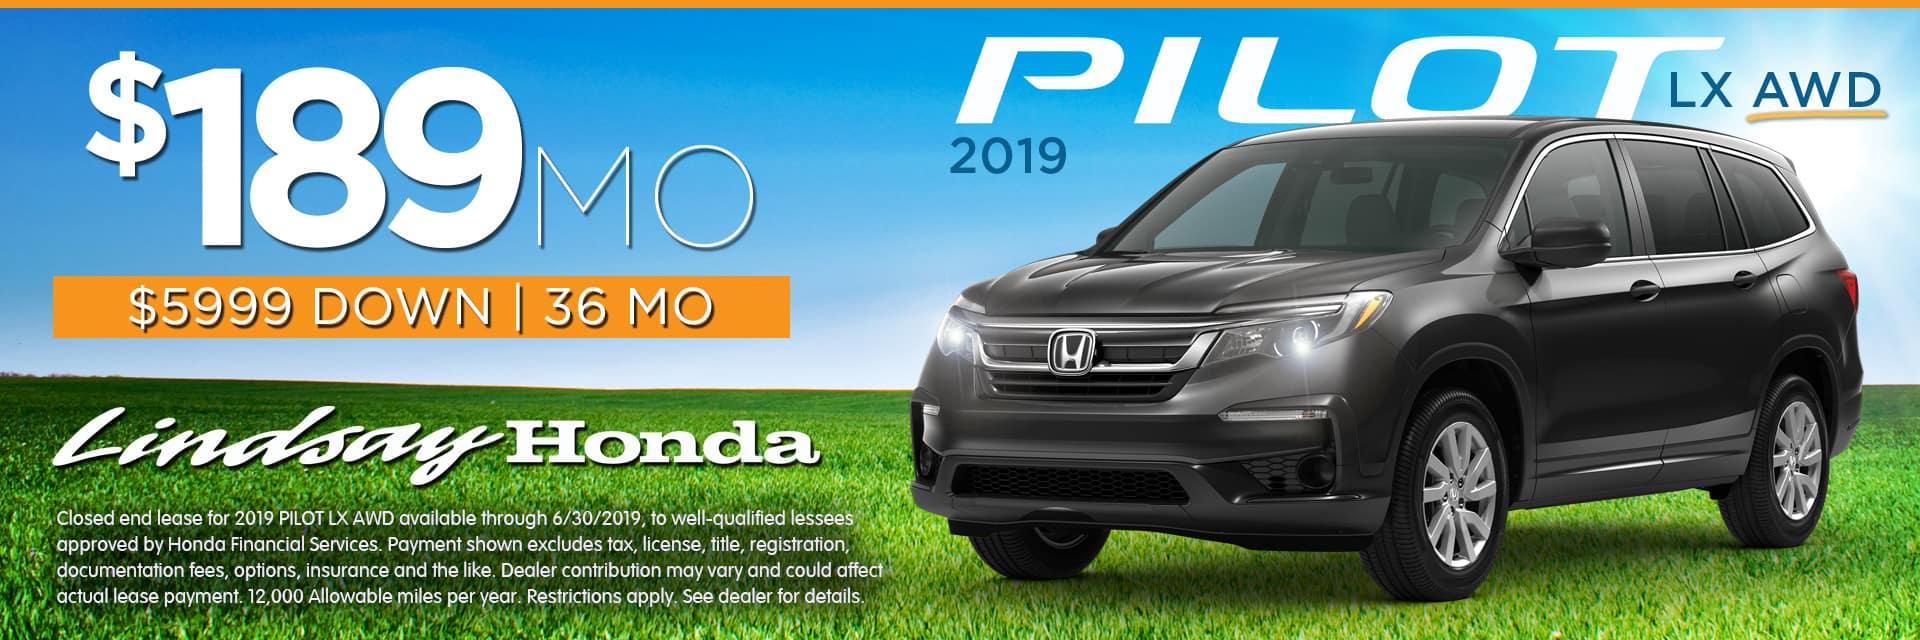 Honda Dealers Dayton Ohio >> Lindsay Honda Honda Dealer In Columbus Oh